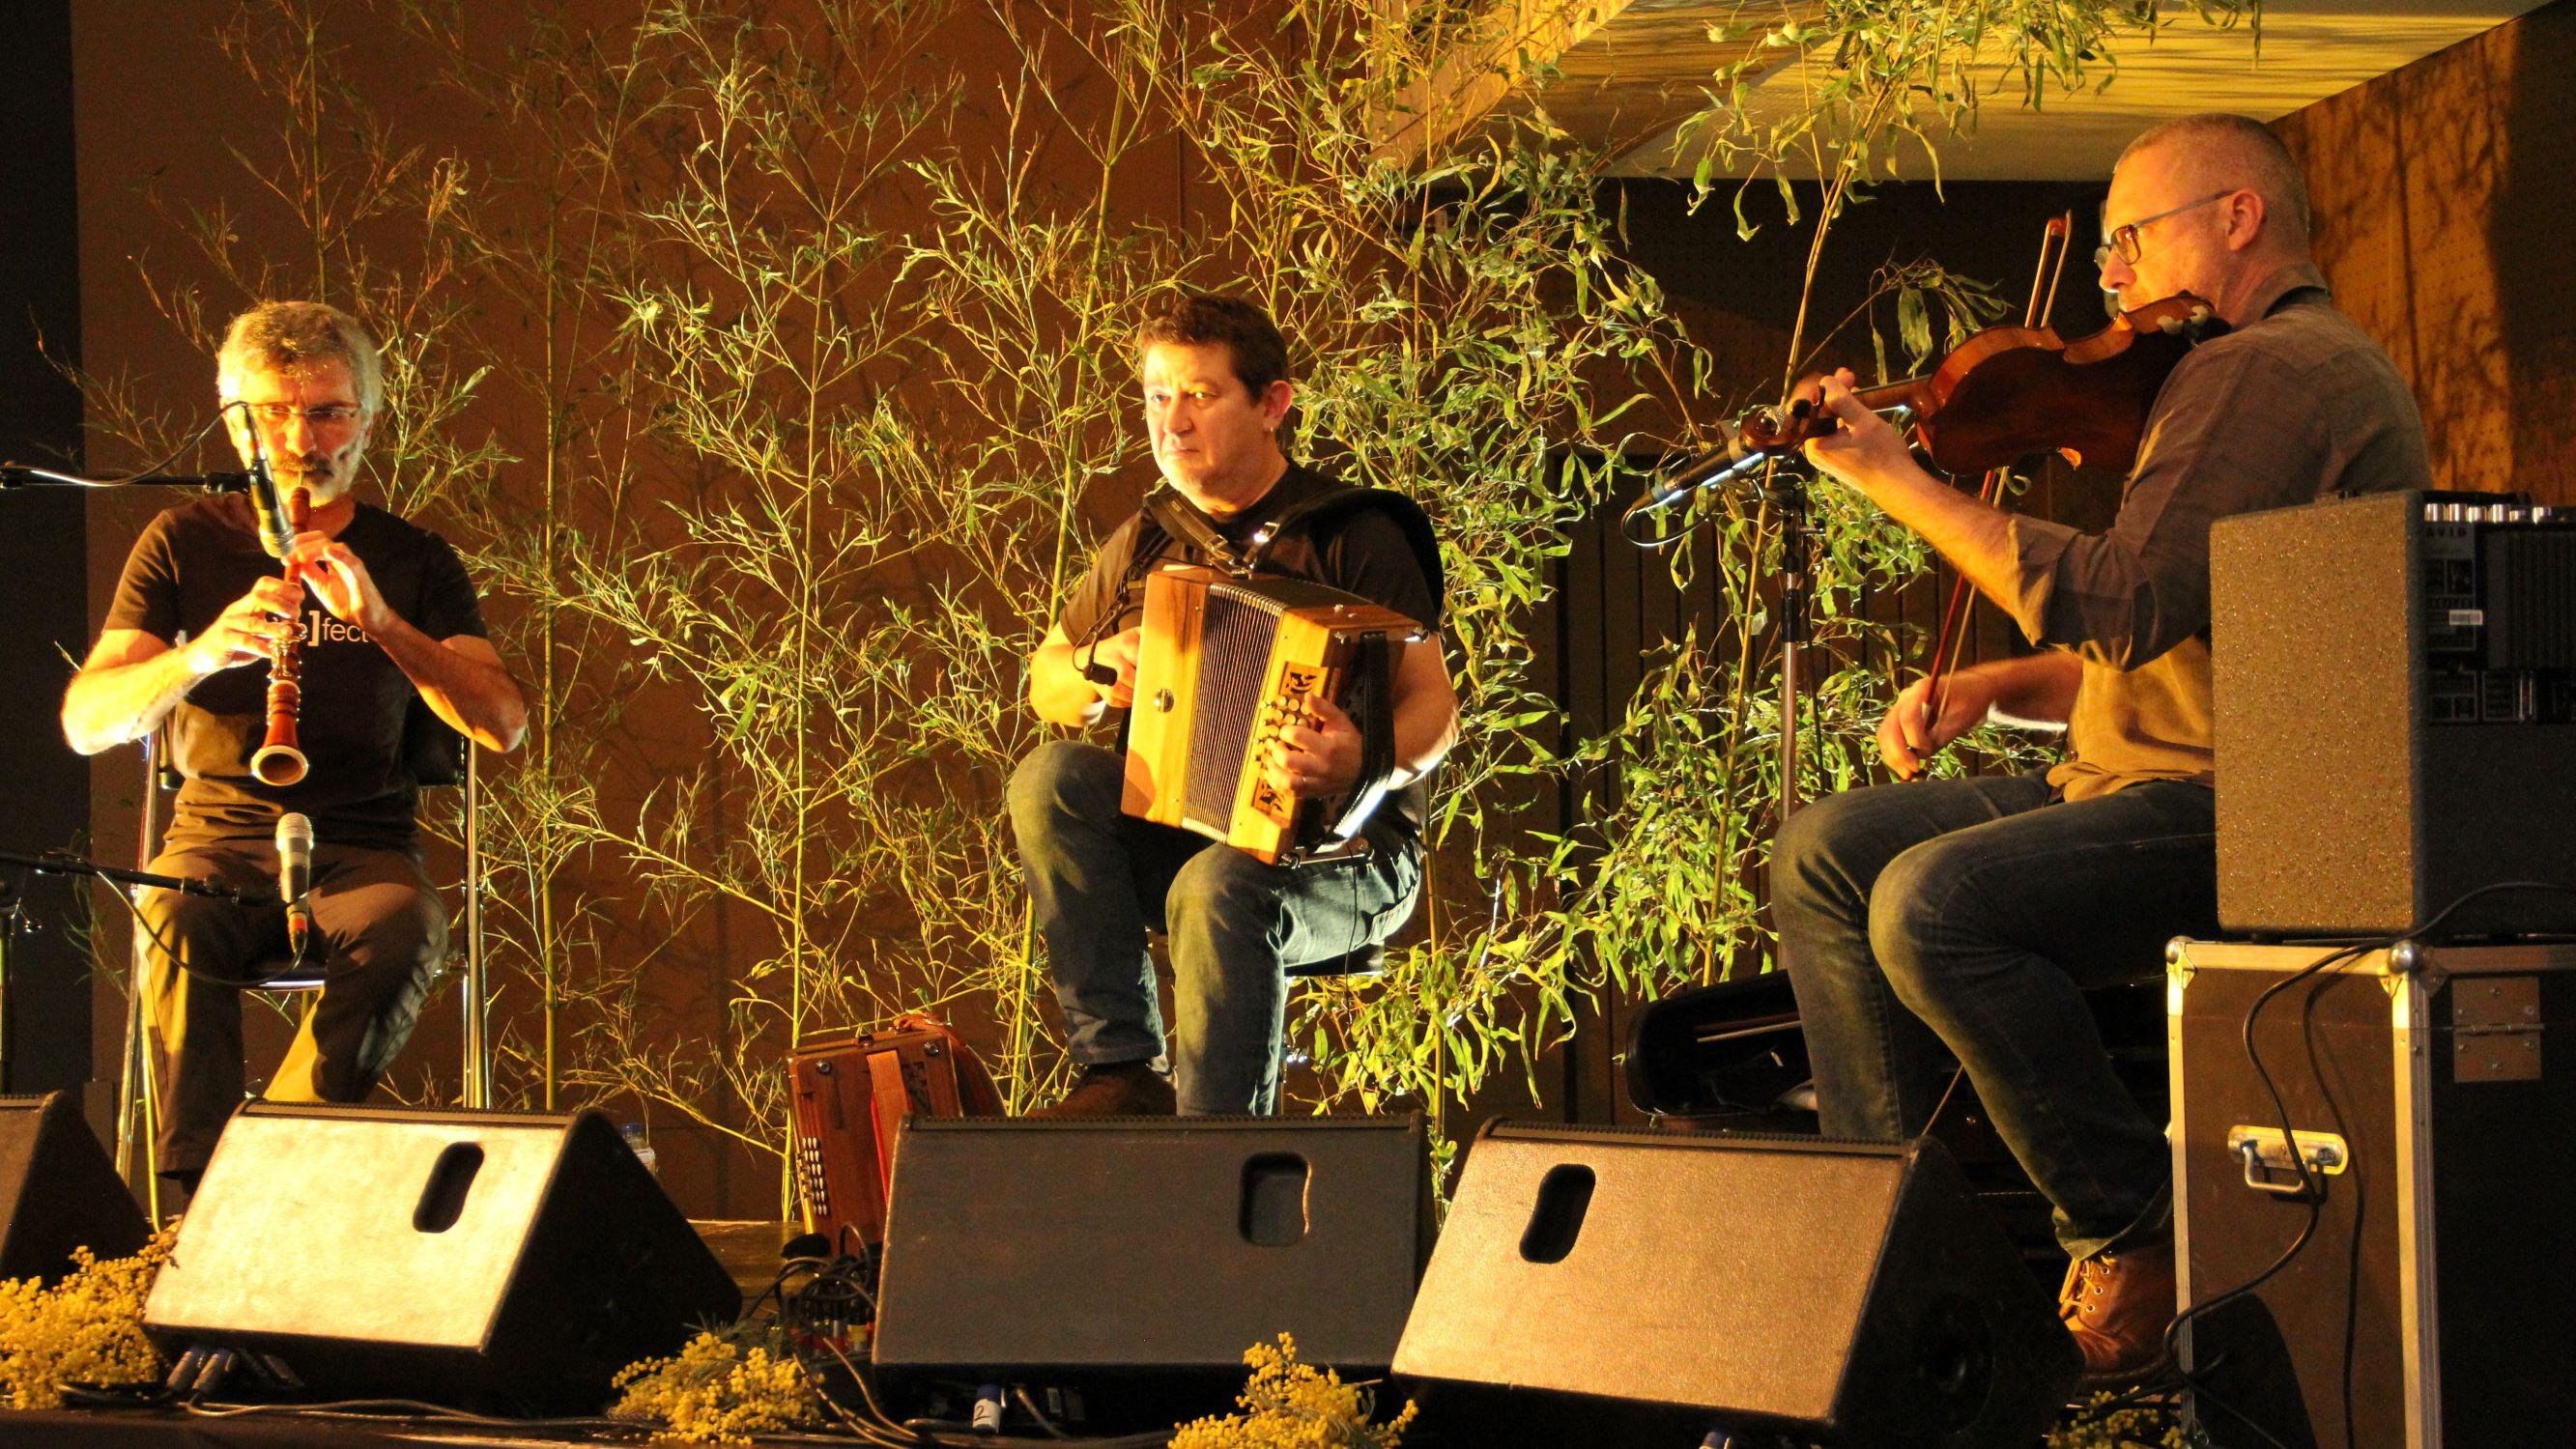 2020-02-01-Fest-Noz-Anniversaire-40-ans-Koria-Fest-Noz-01L